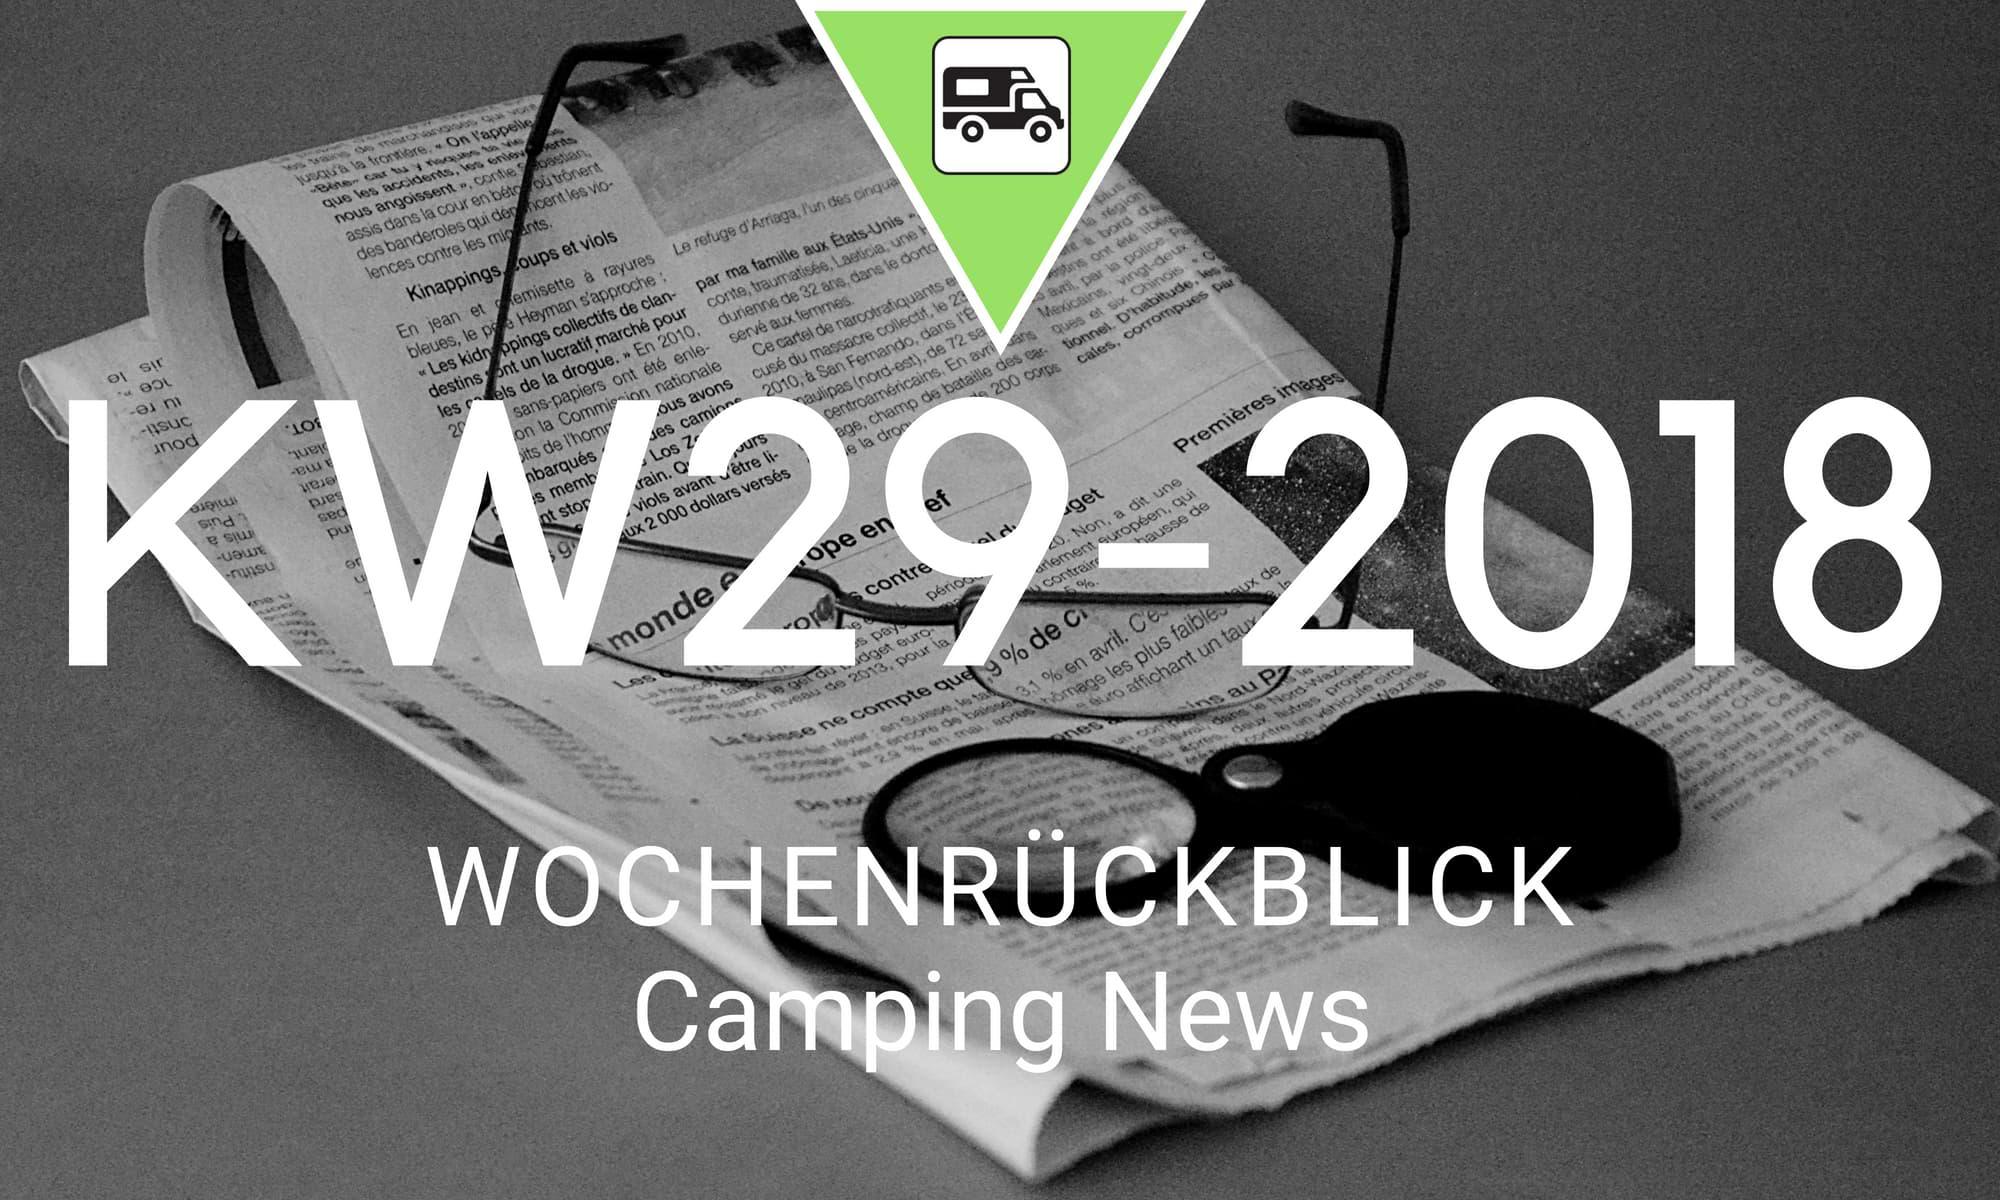 Wochenrückblick Camping News KW29-2018